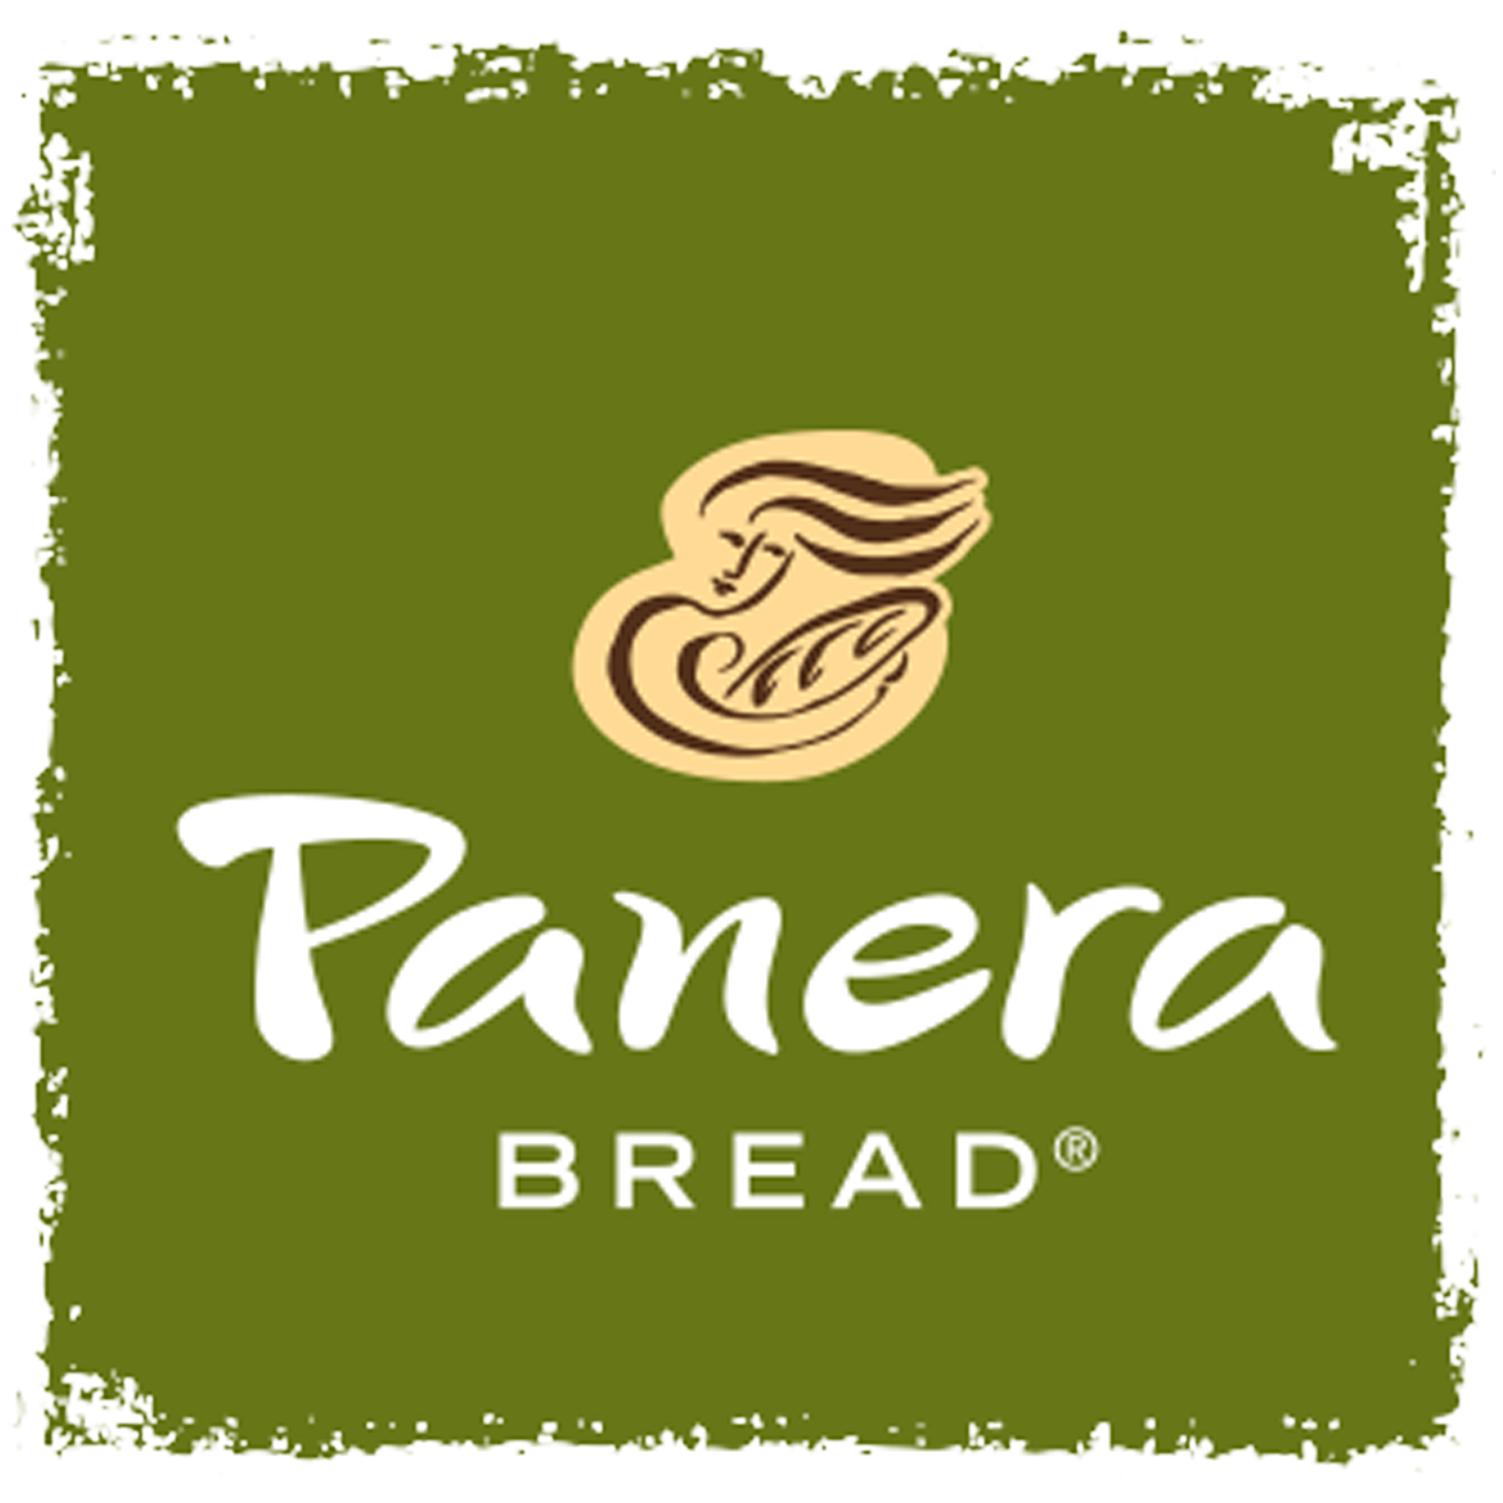 Panera Bread logo from Zestful catalog